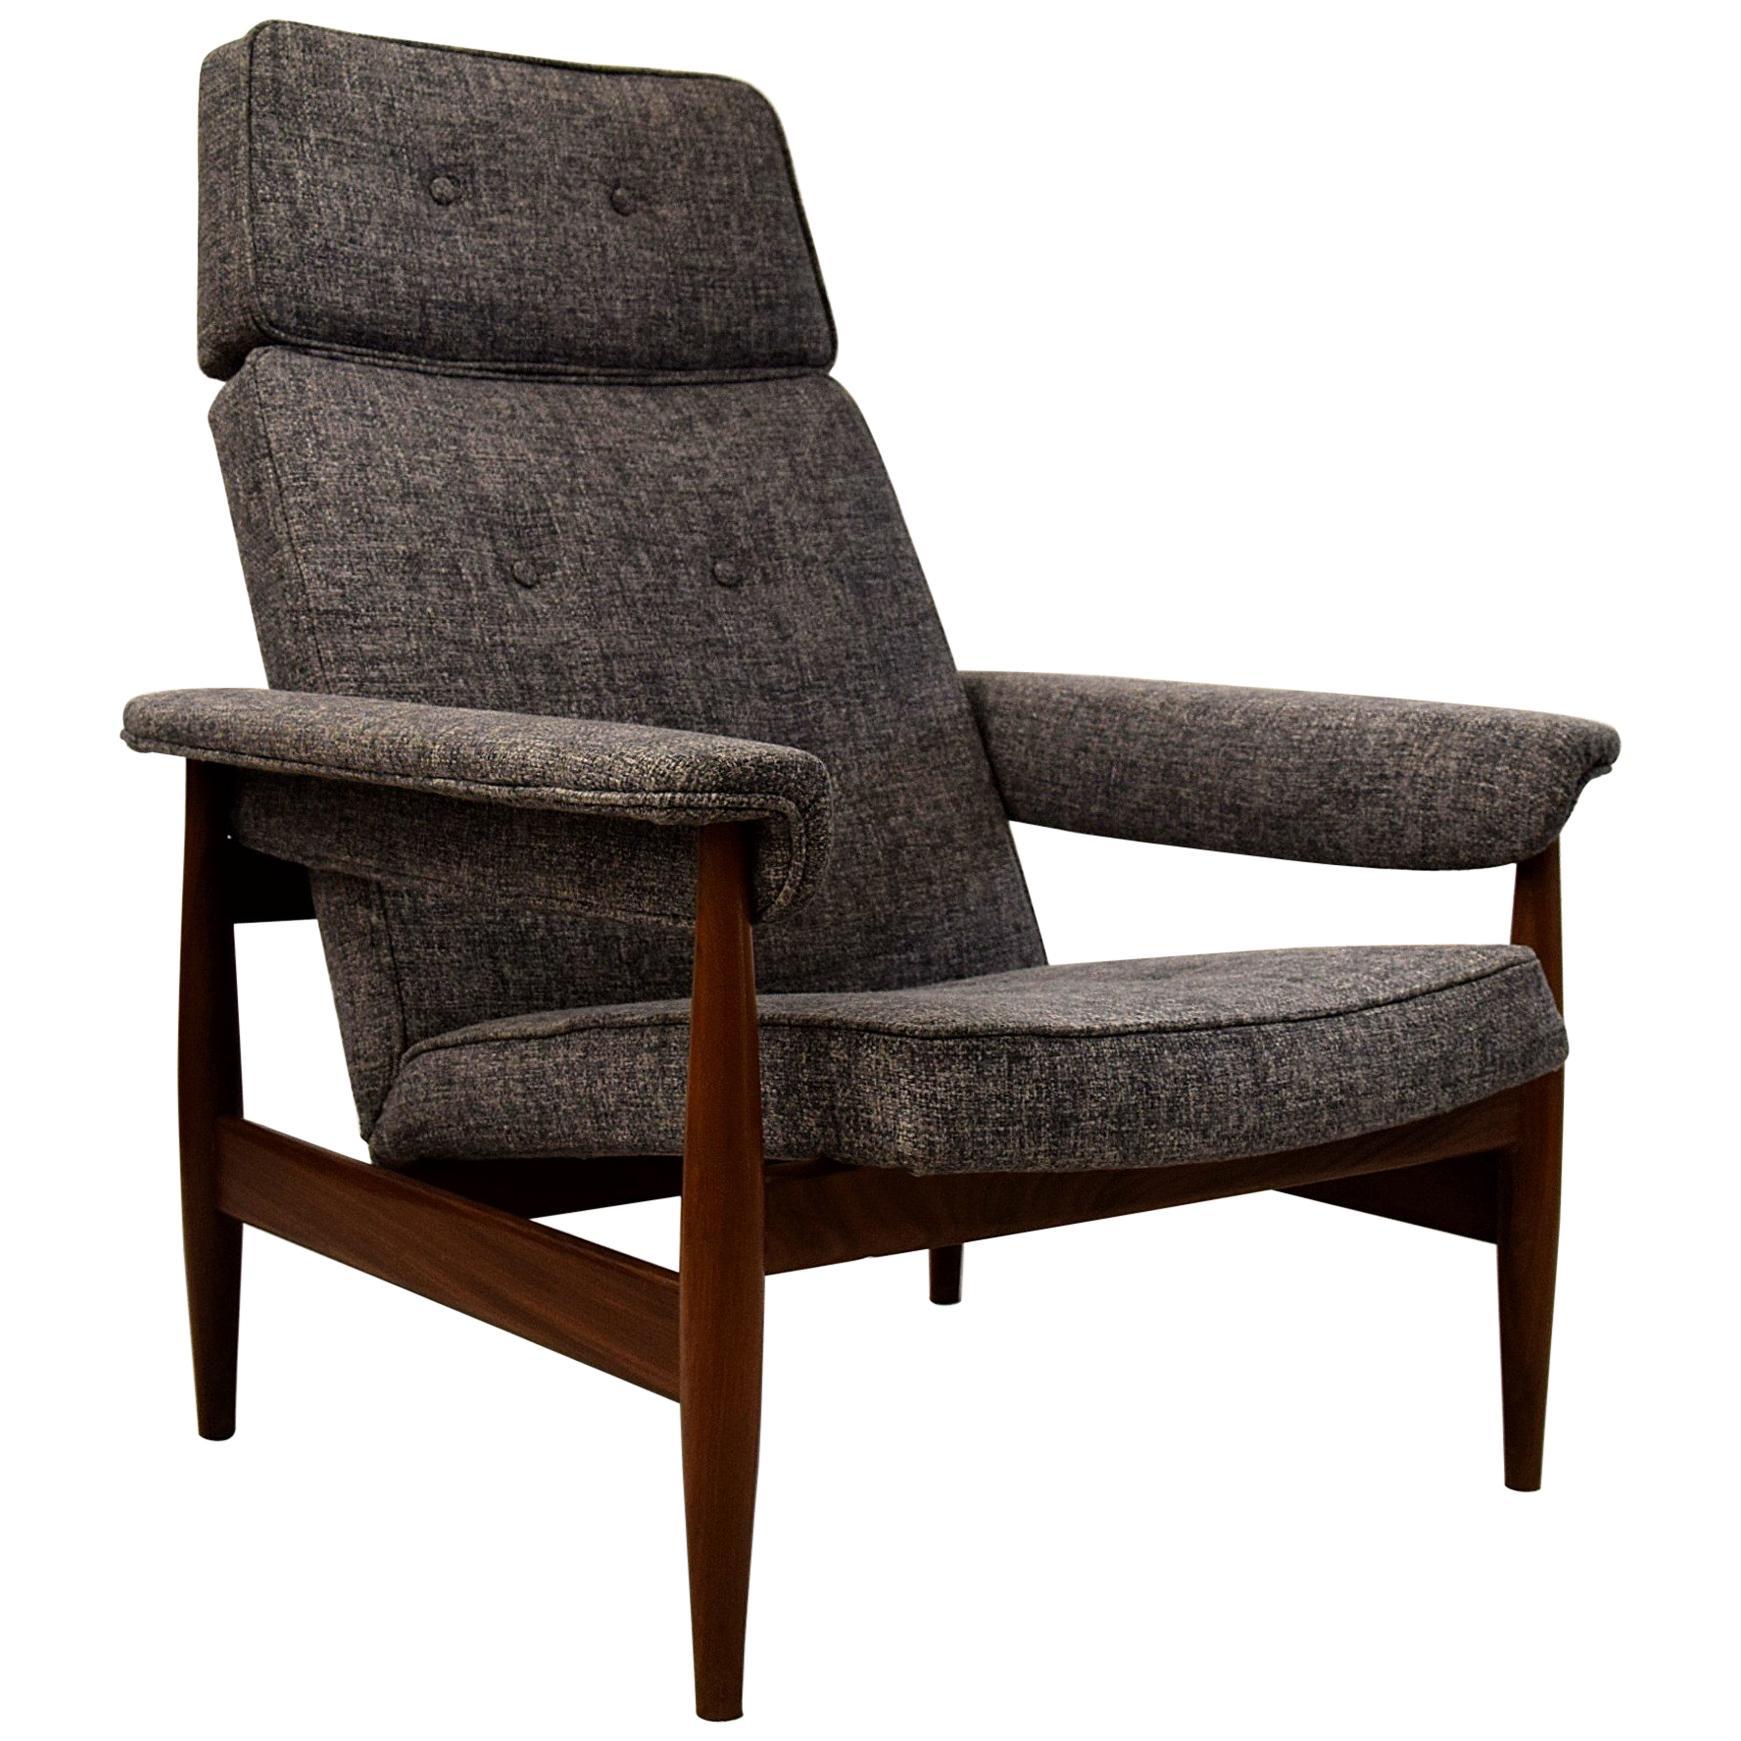 Mid century modern teak lounge chair